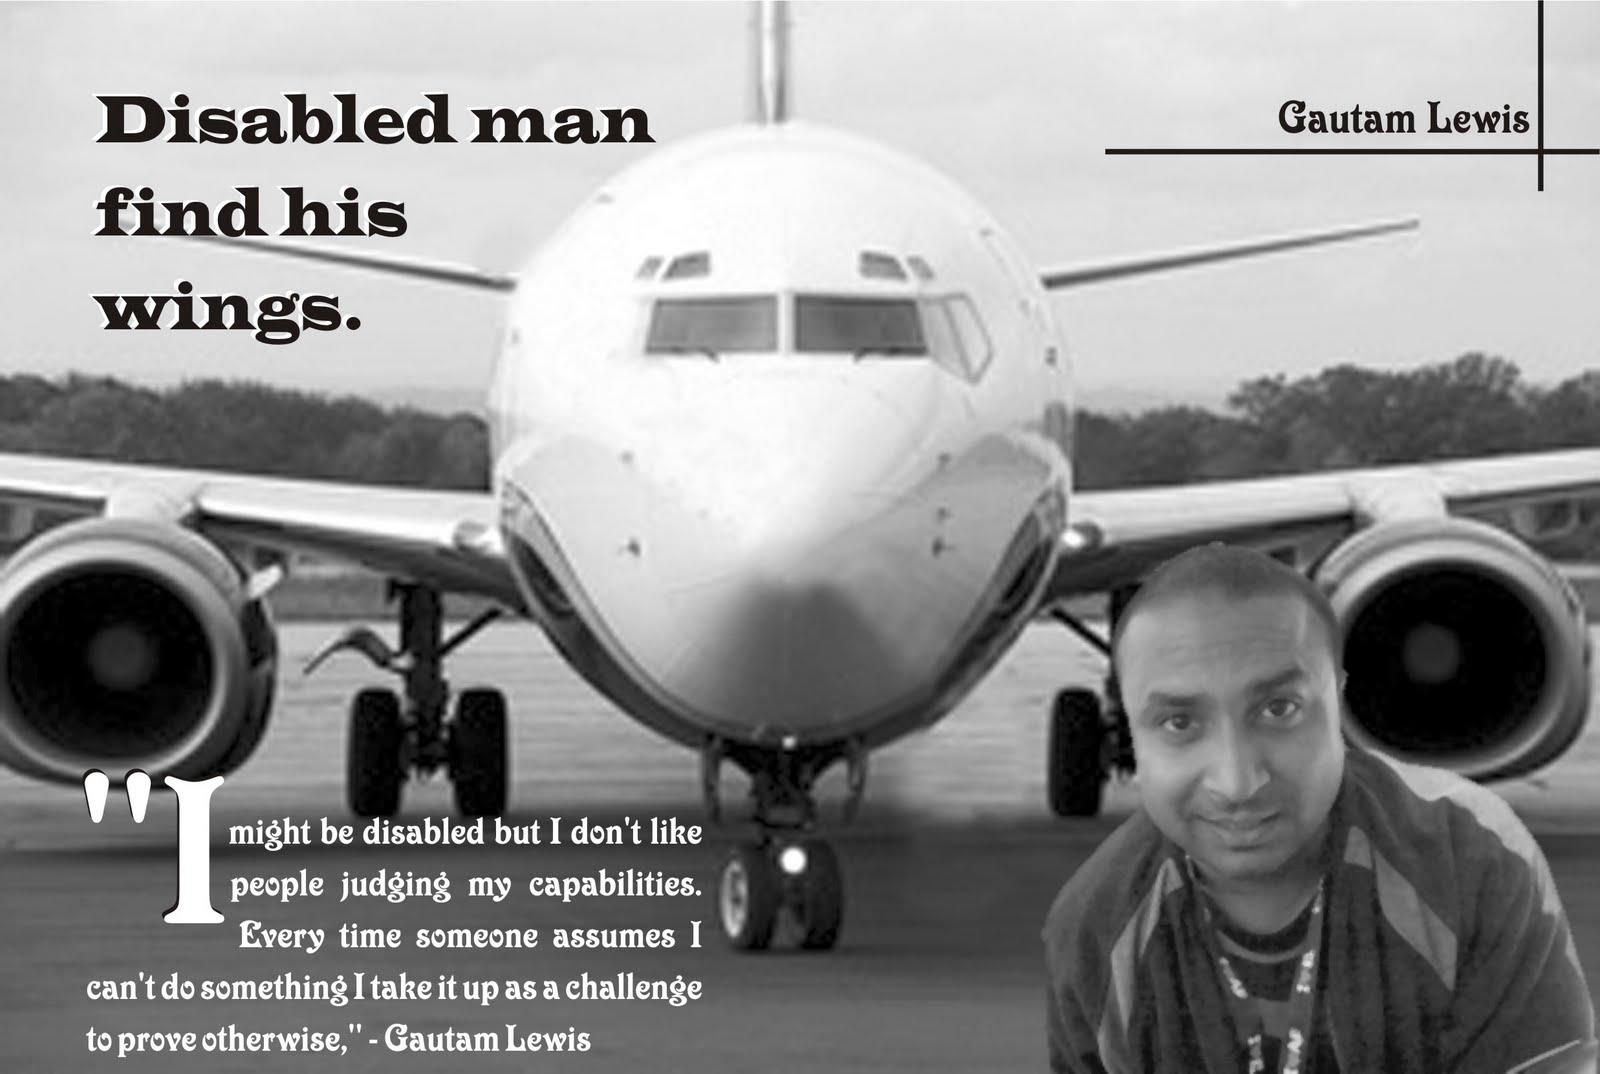 https://i0.wp.com/3.bp.blogspot.com/_QdzO4z8zux0/S7LNH_P3bwI/AAAAAAAAALc/v1DBaD_V2lw/s1600/Disabled+man.jpg